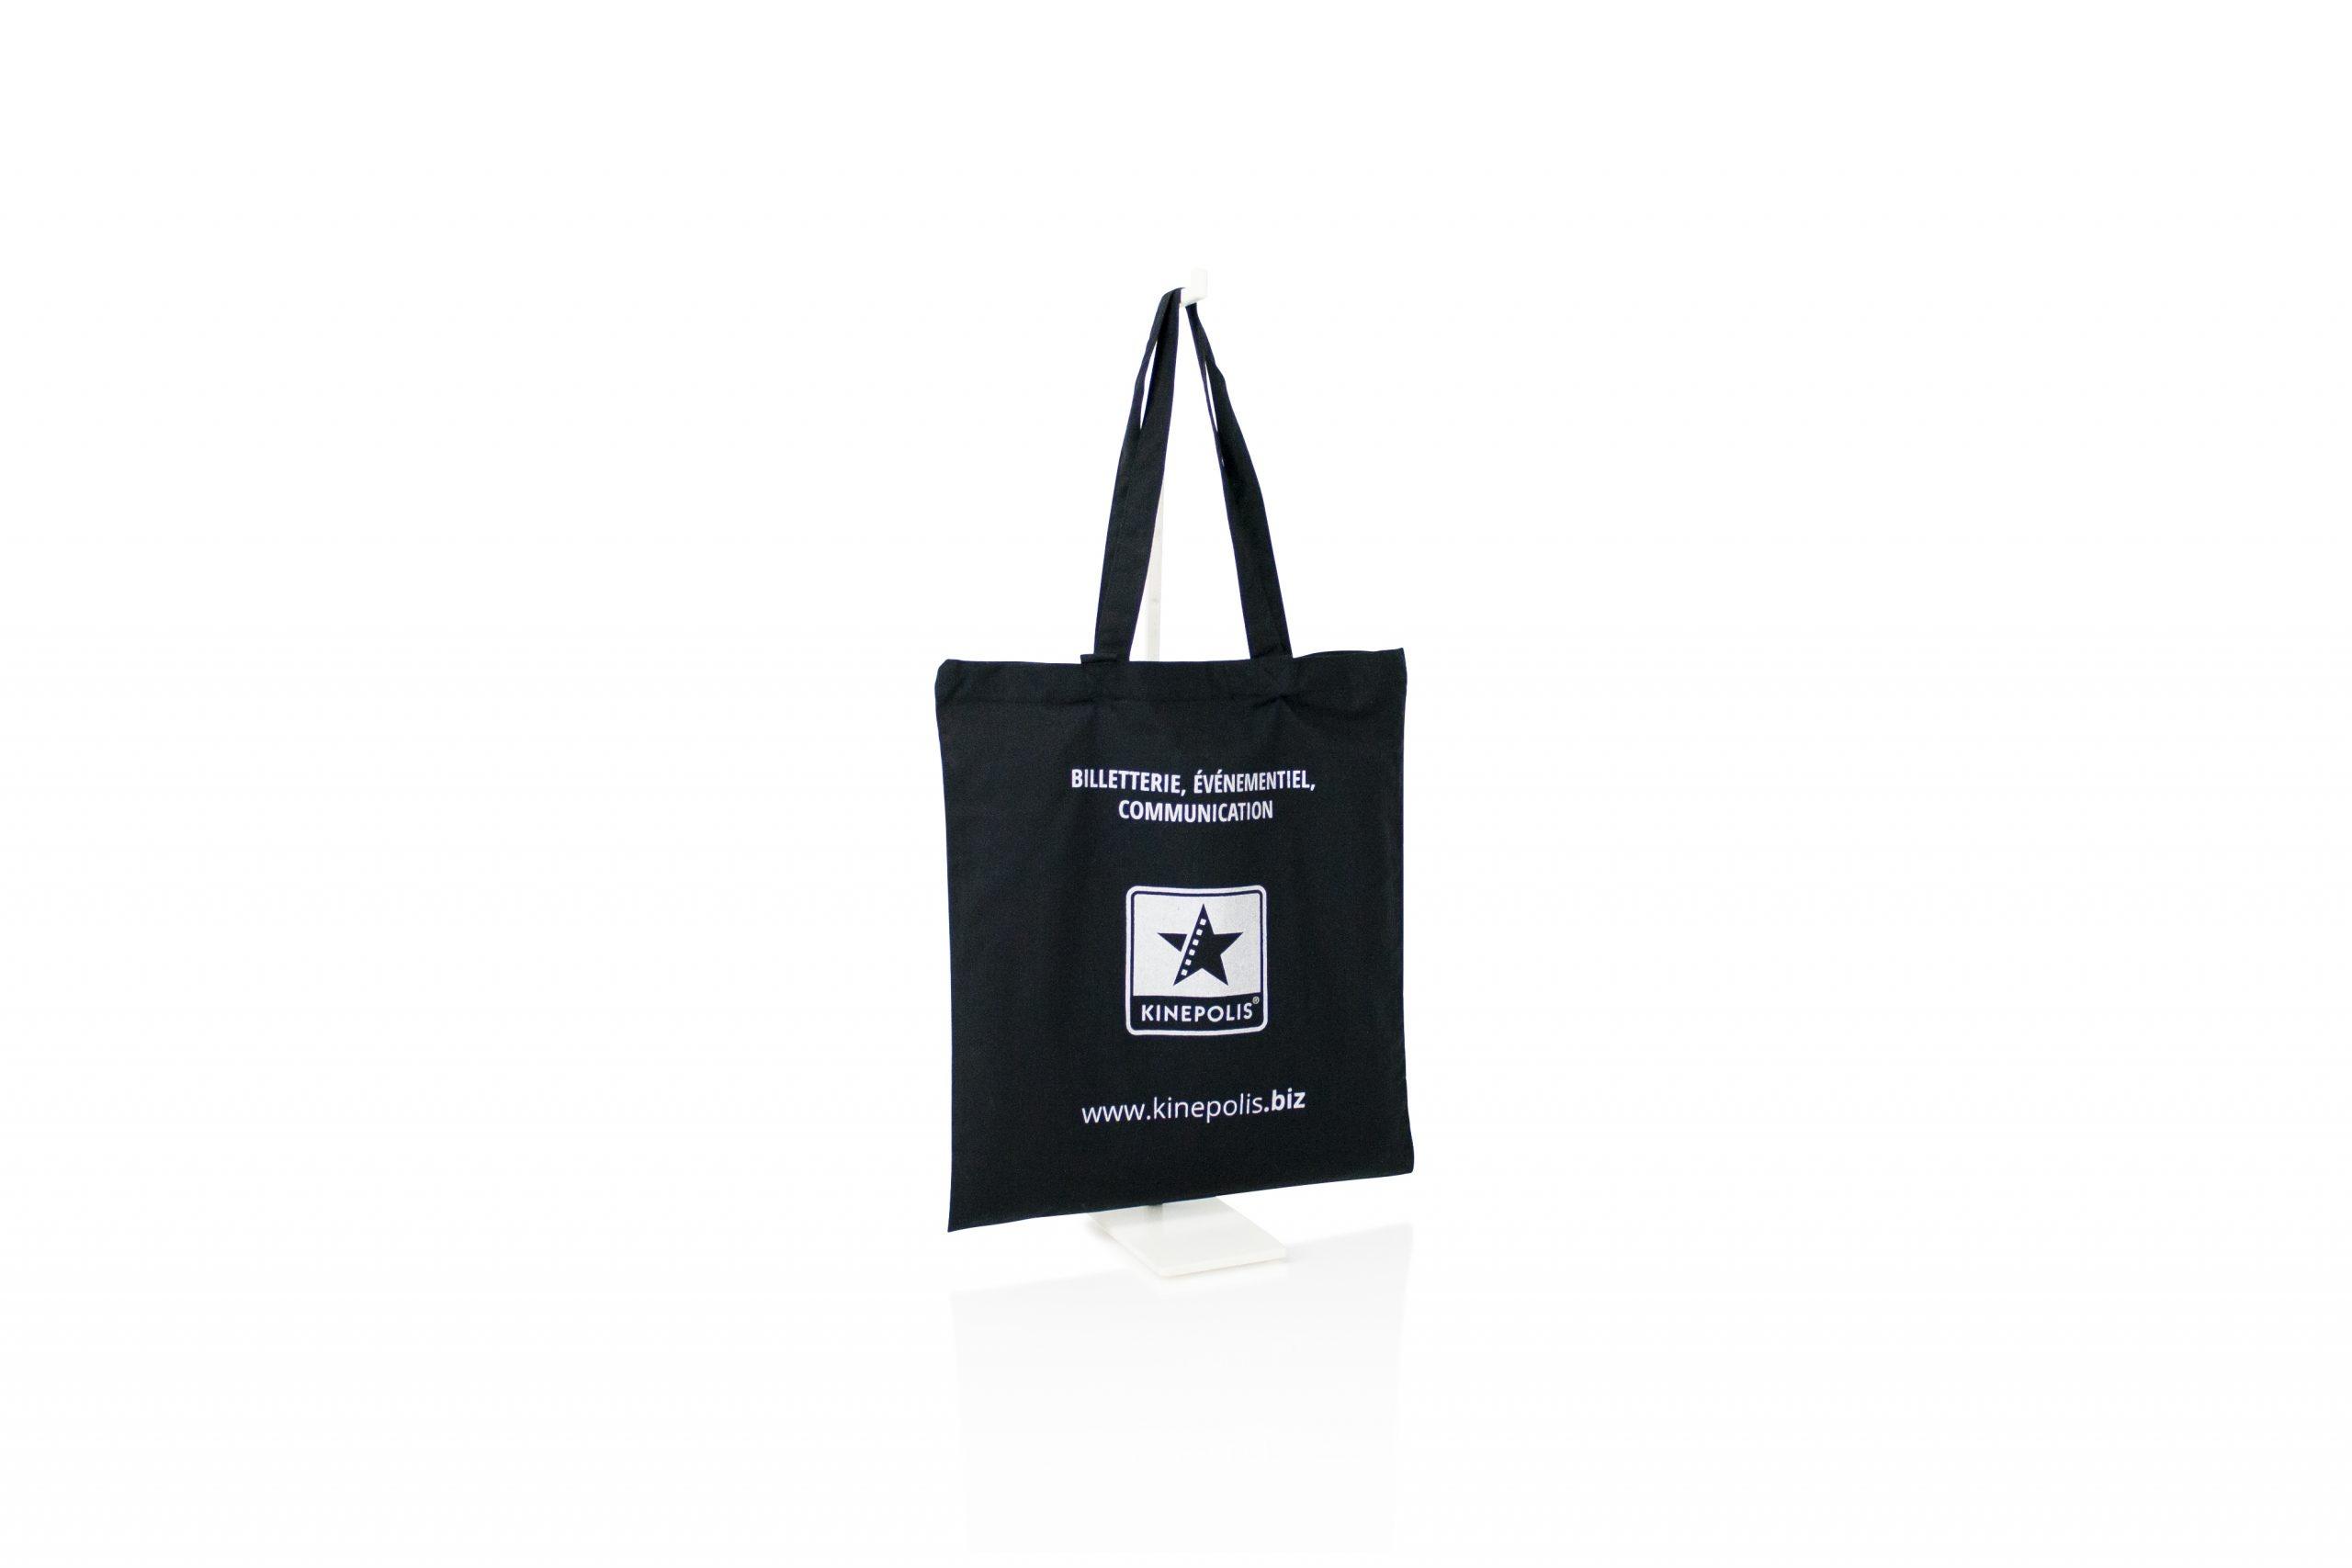 Ecologische katoenen zak met logo made in EU